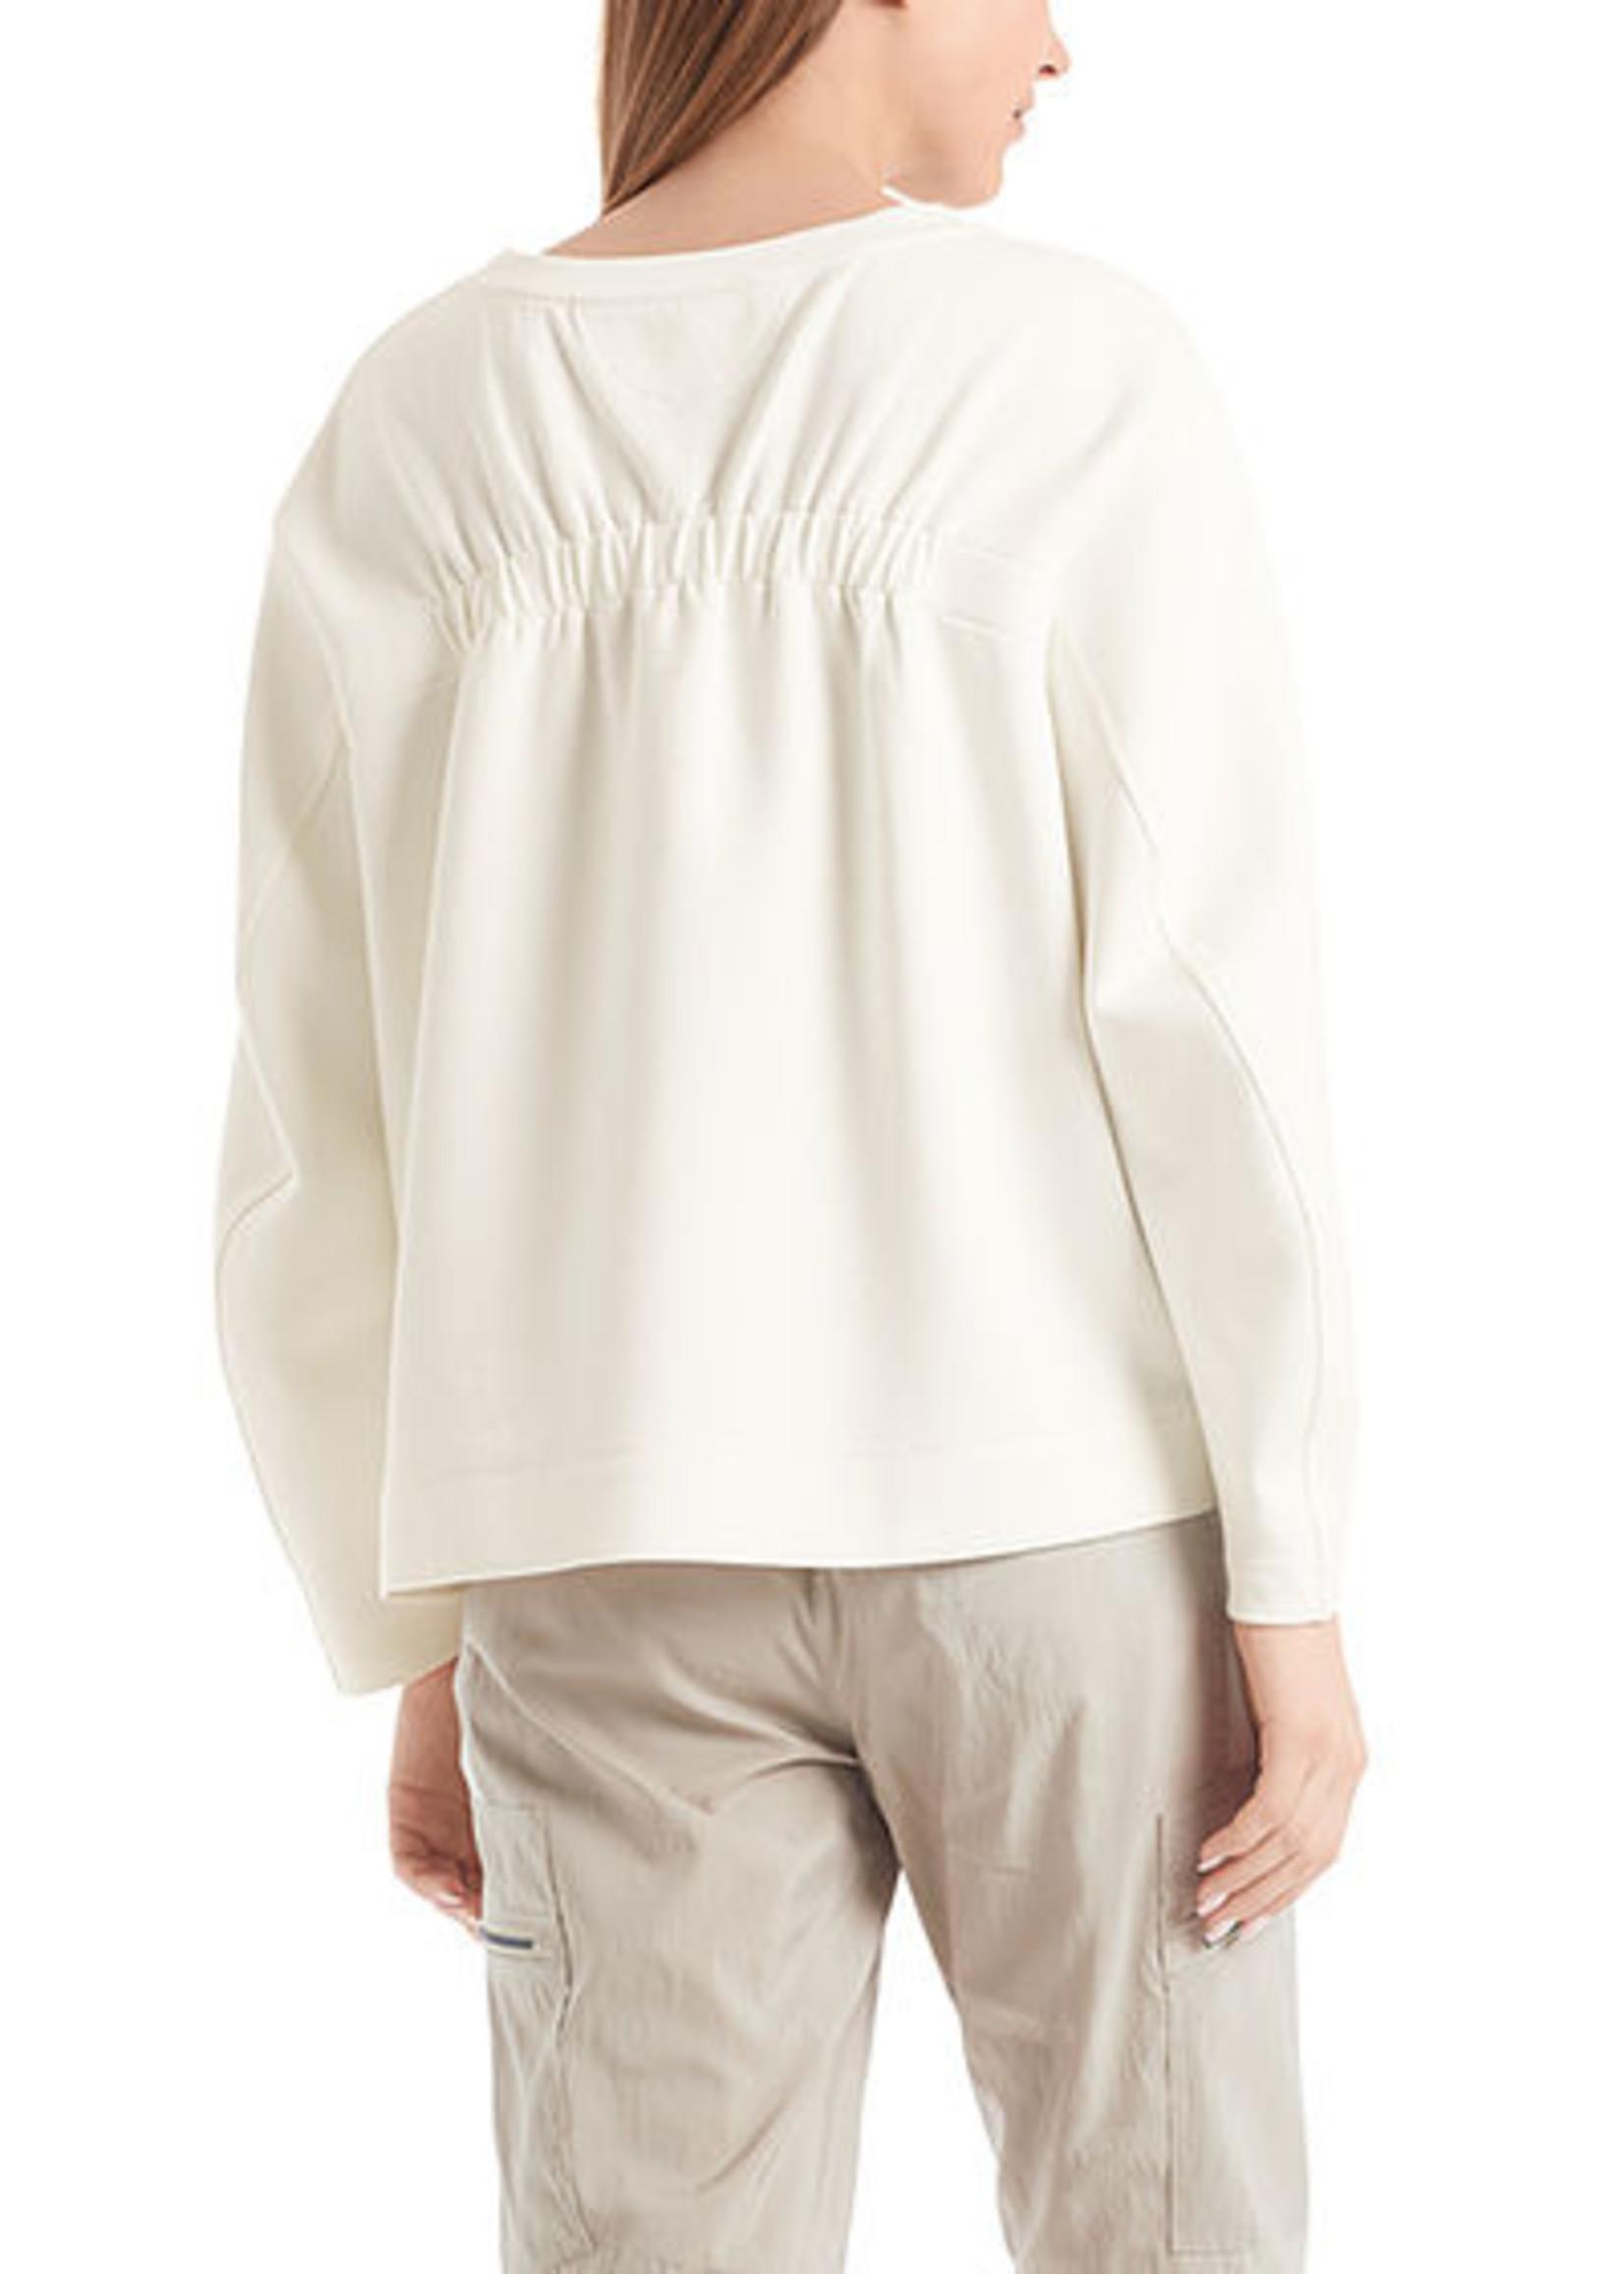 Marccain Sports Sweatshirt RS 44.08 J76 off-white